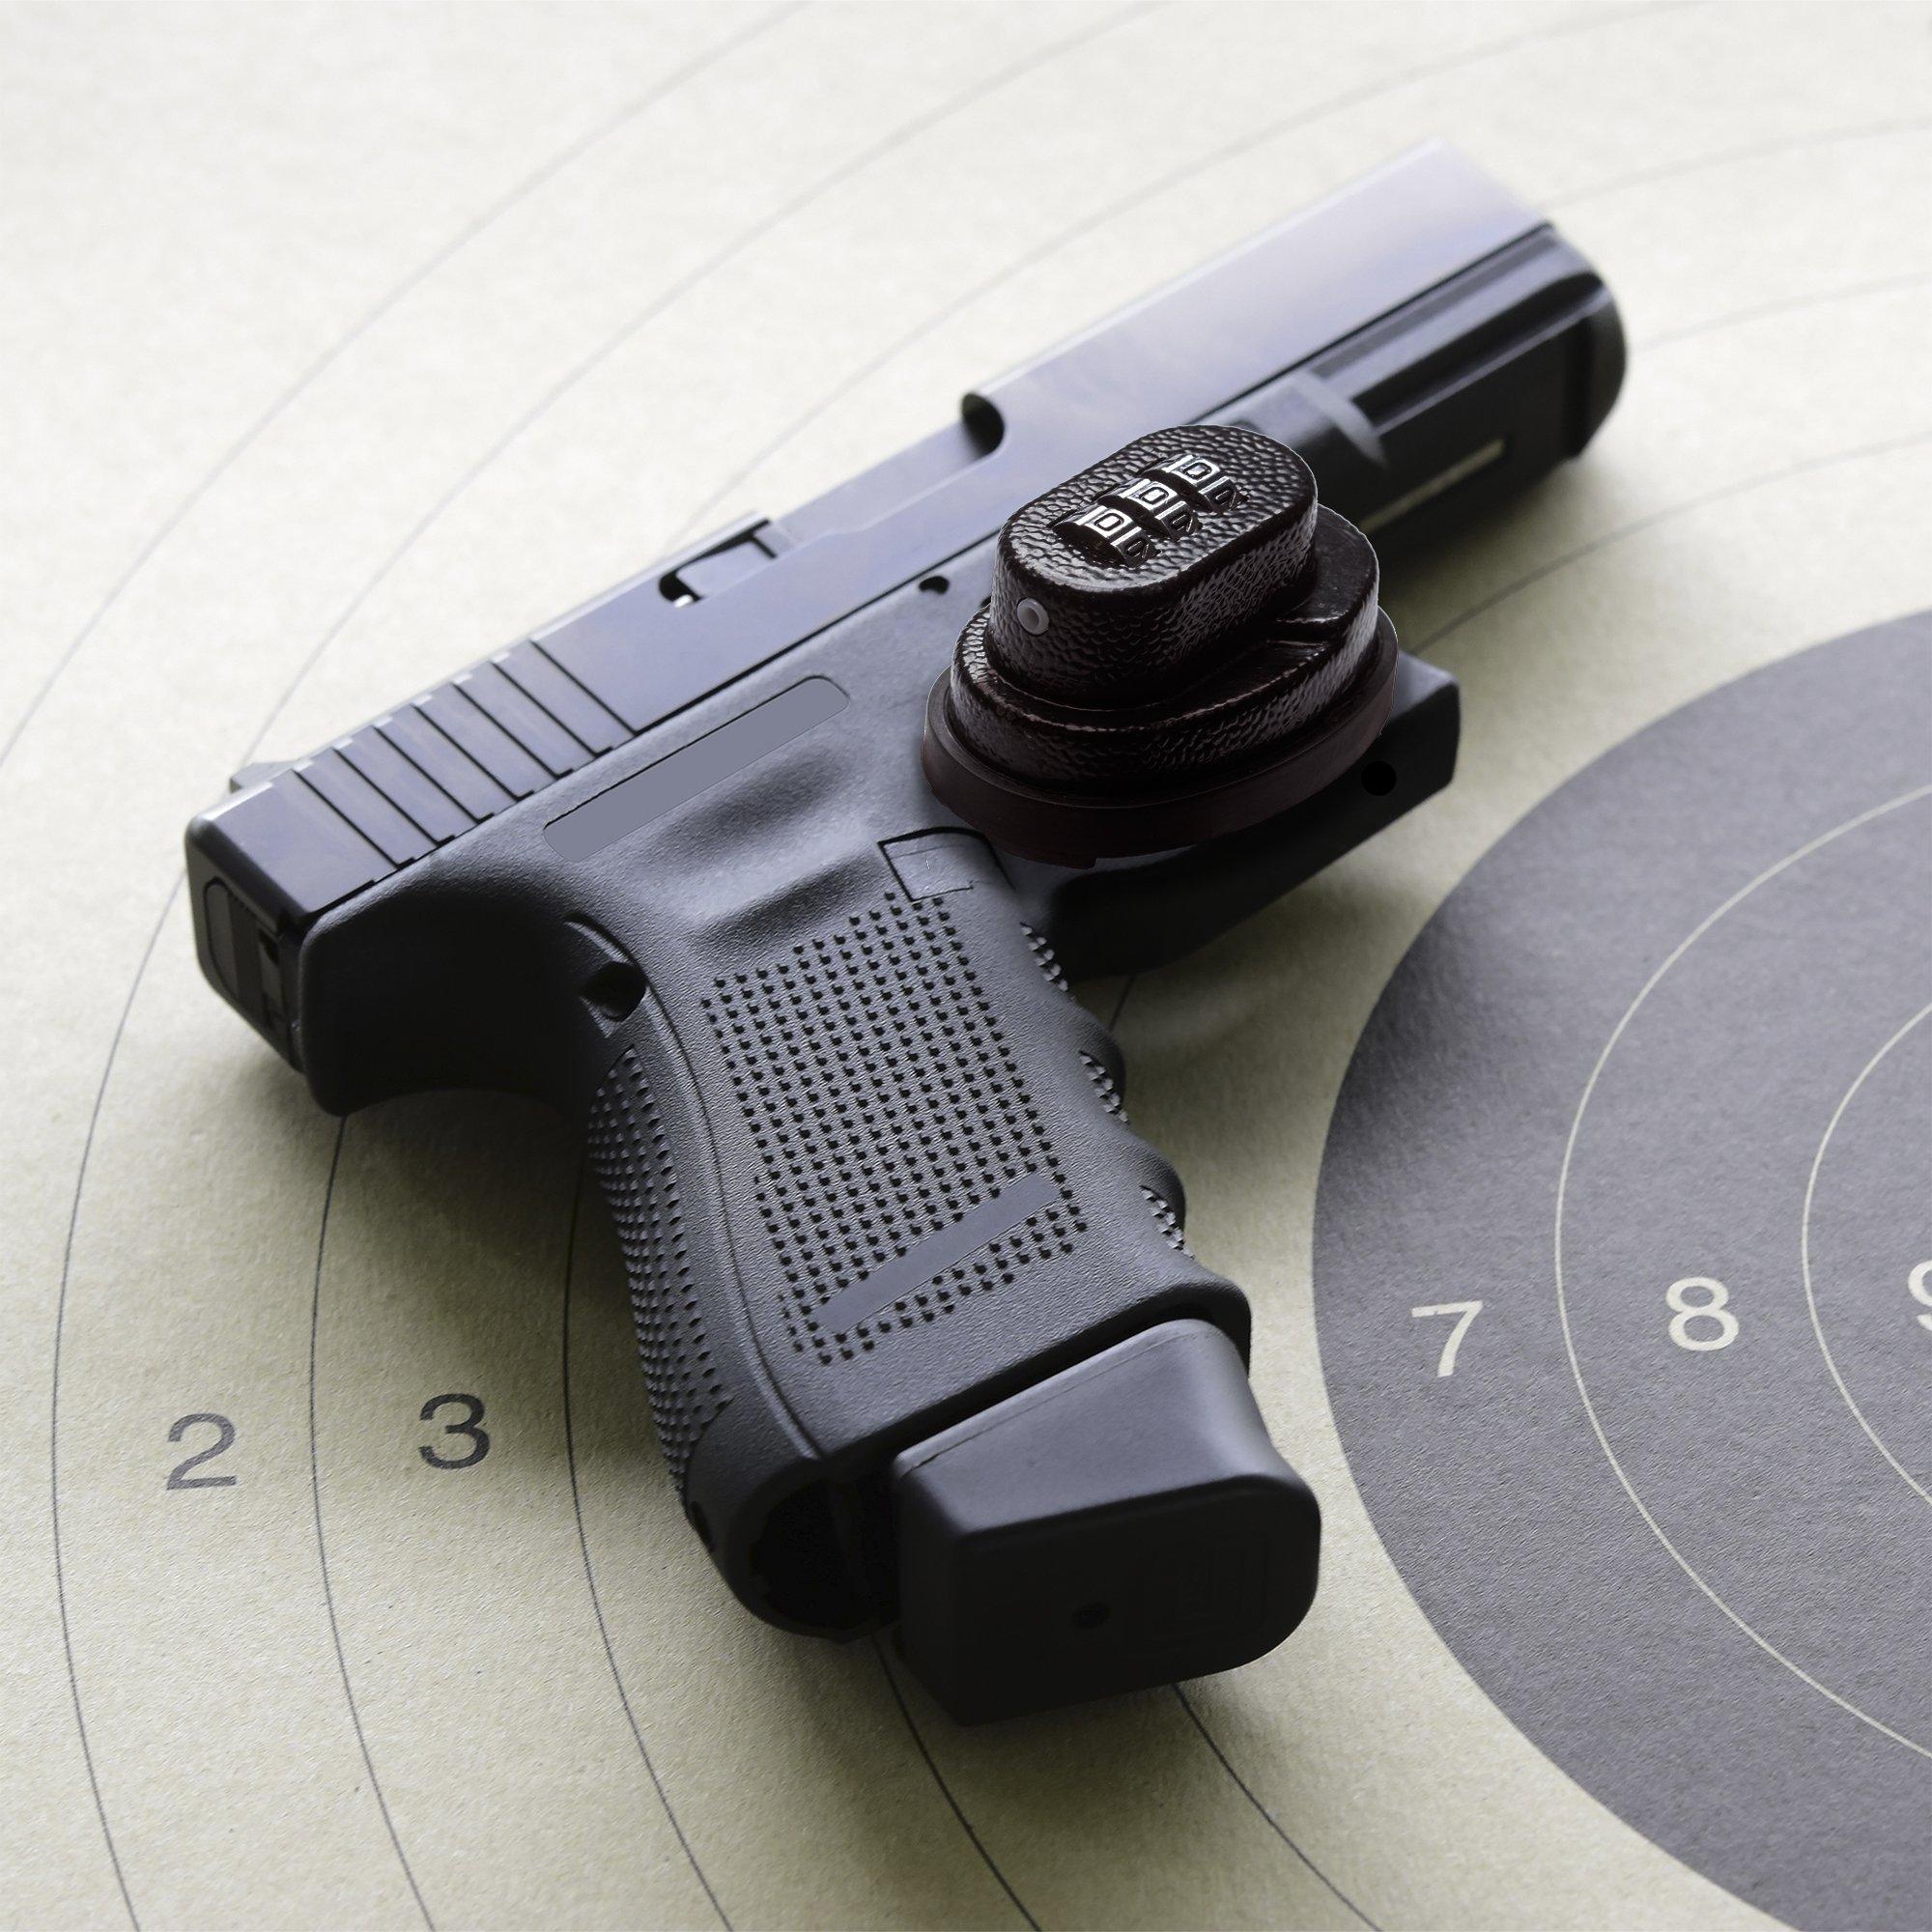 Gun Lock, Outdoor Nation 3-Digit Combination Gun Lock by Outdoor Nation (Image #2)